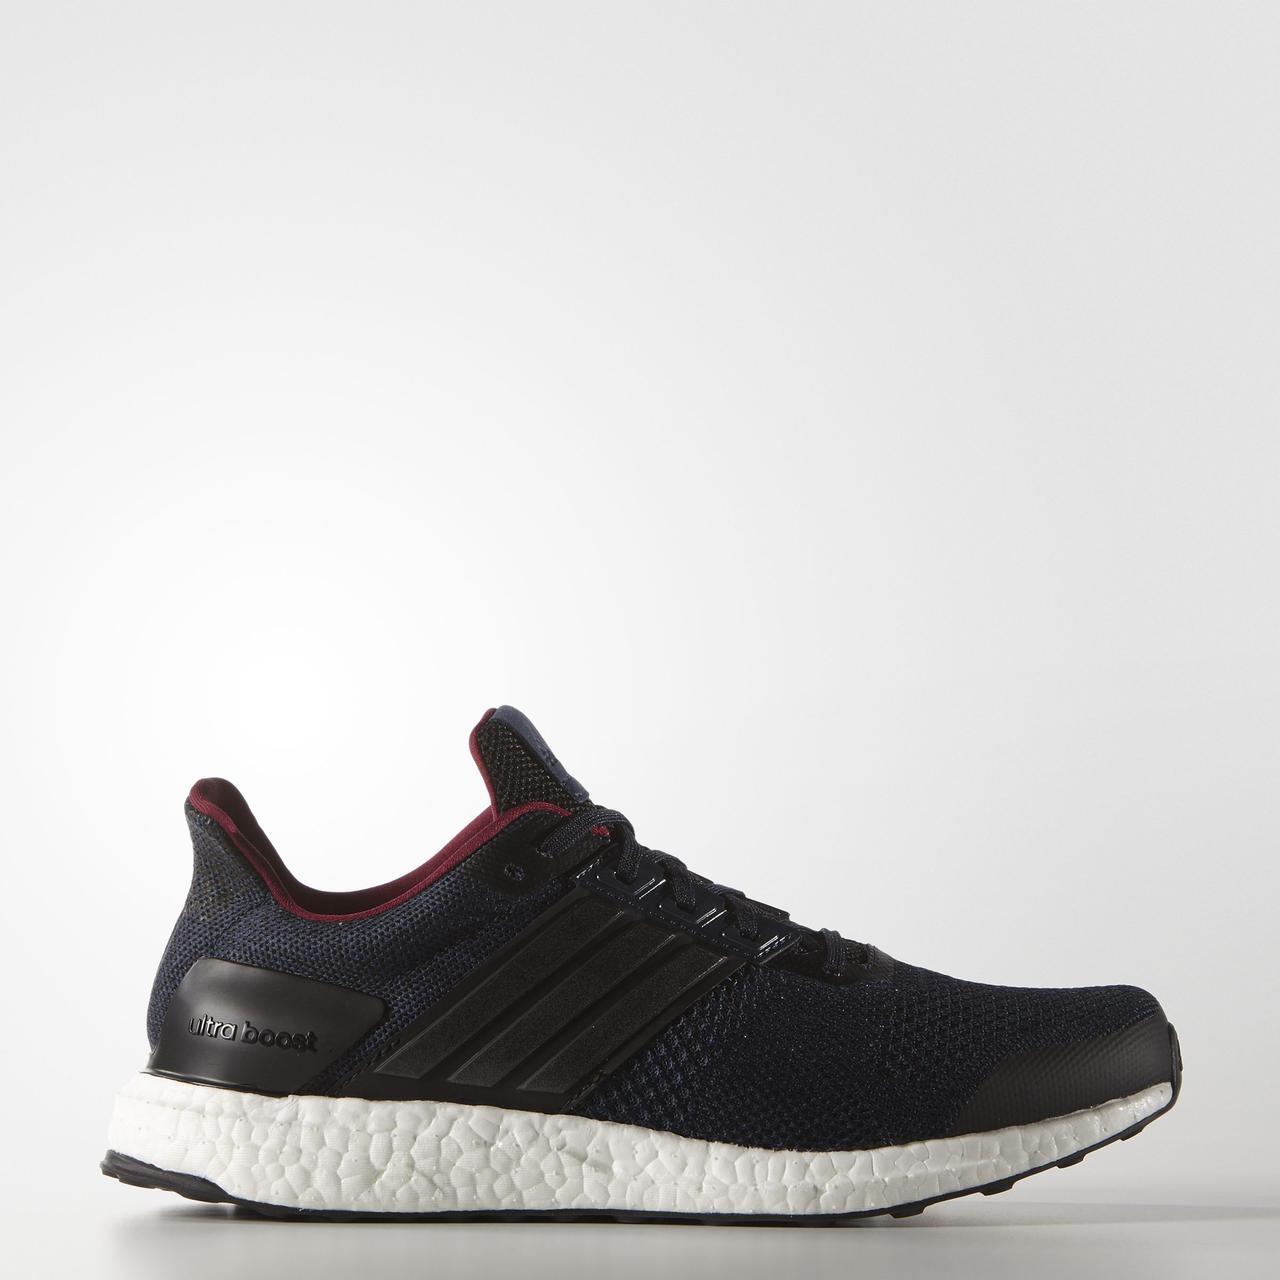 76674d55ebc7 Мужские Кроссовки Adidas Ultra Boost ST Shoes BB3931  продажа, цена ...